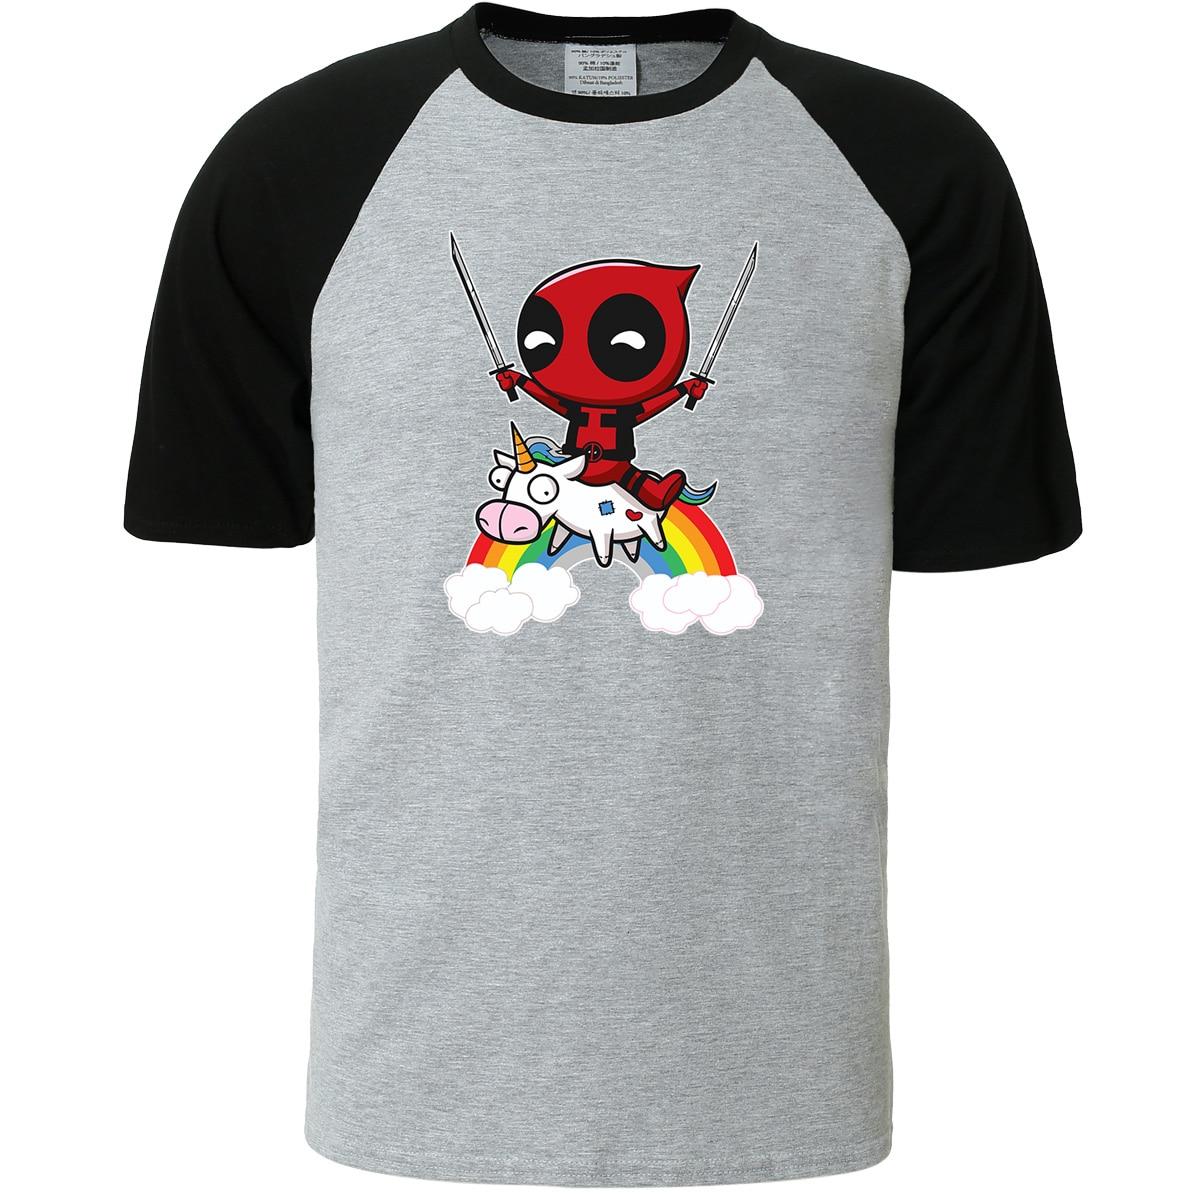 Funny T-shirt For Male Top DEADPOOL Cartoon Animal T Shirt Men 2019 Summer Raglan Sleeve Tshirt Harajuku Men's T-shirts Kpop